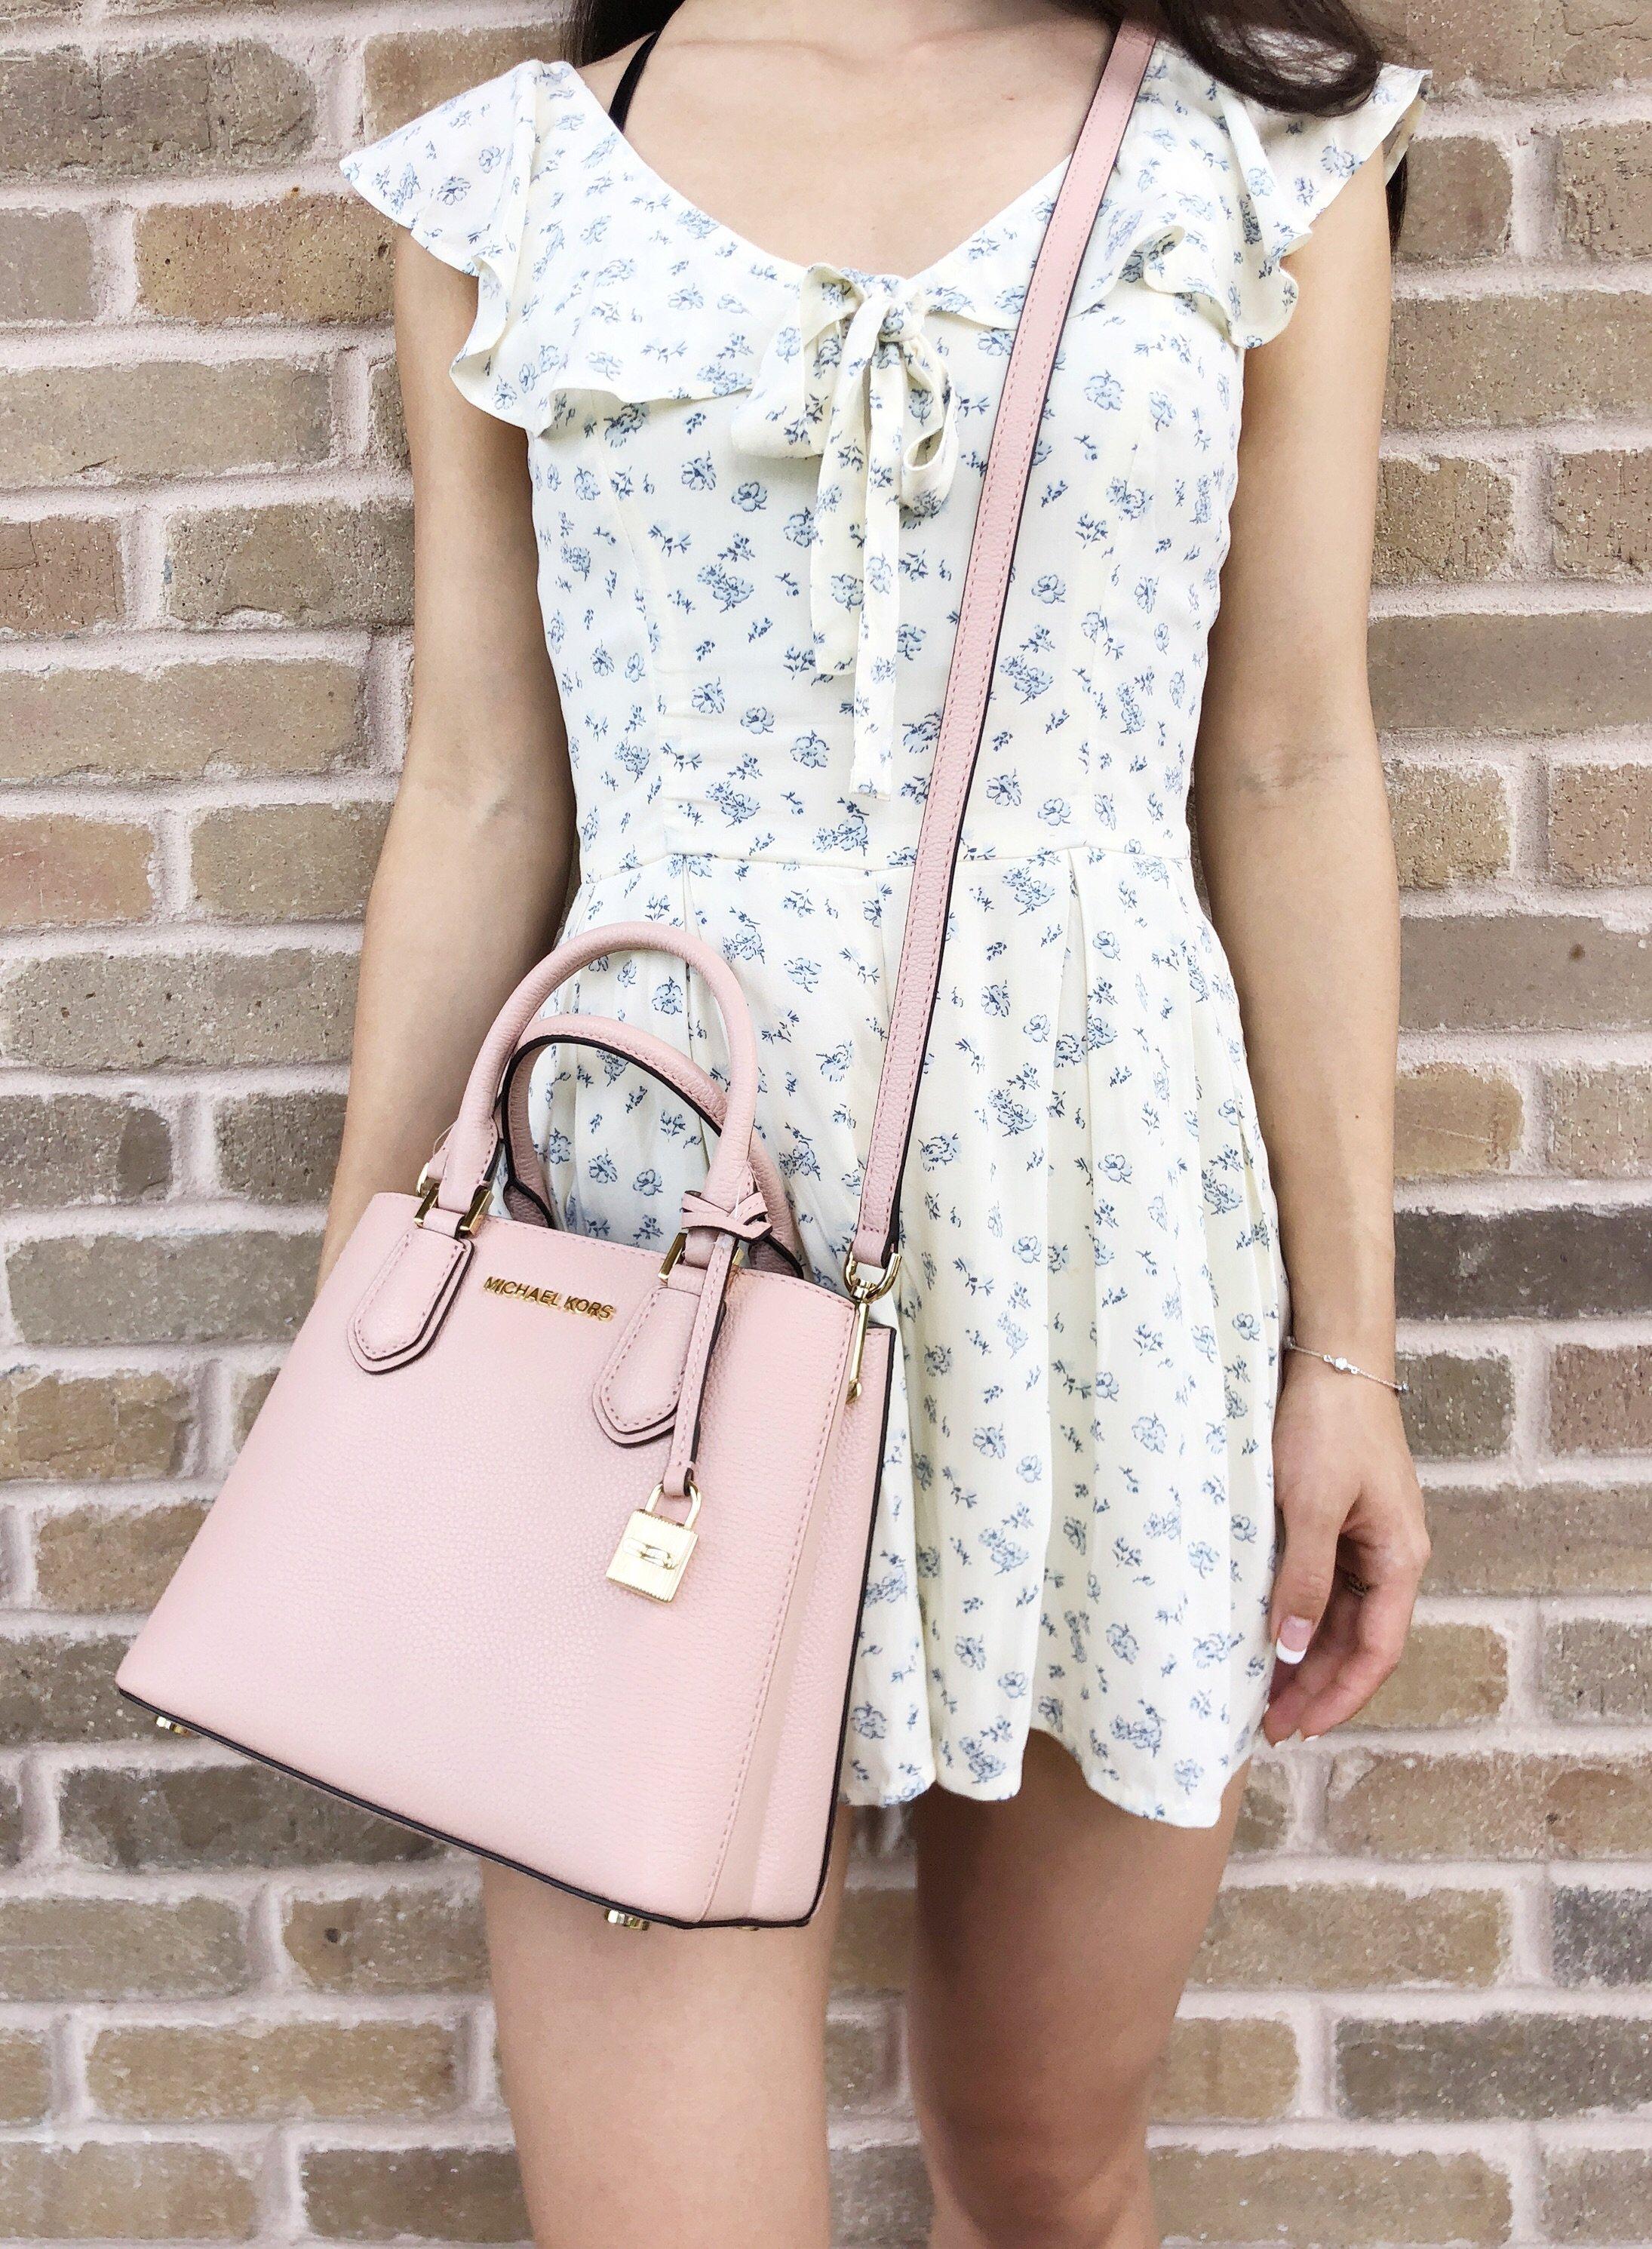 94b32062d292 Michael Kors Adele Mercer Medium Messenger Bag Pastel Pink Ballet Leather -  Walmart.com